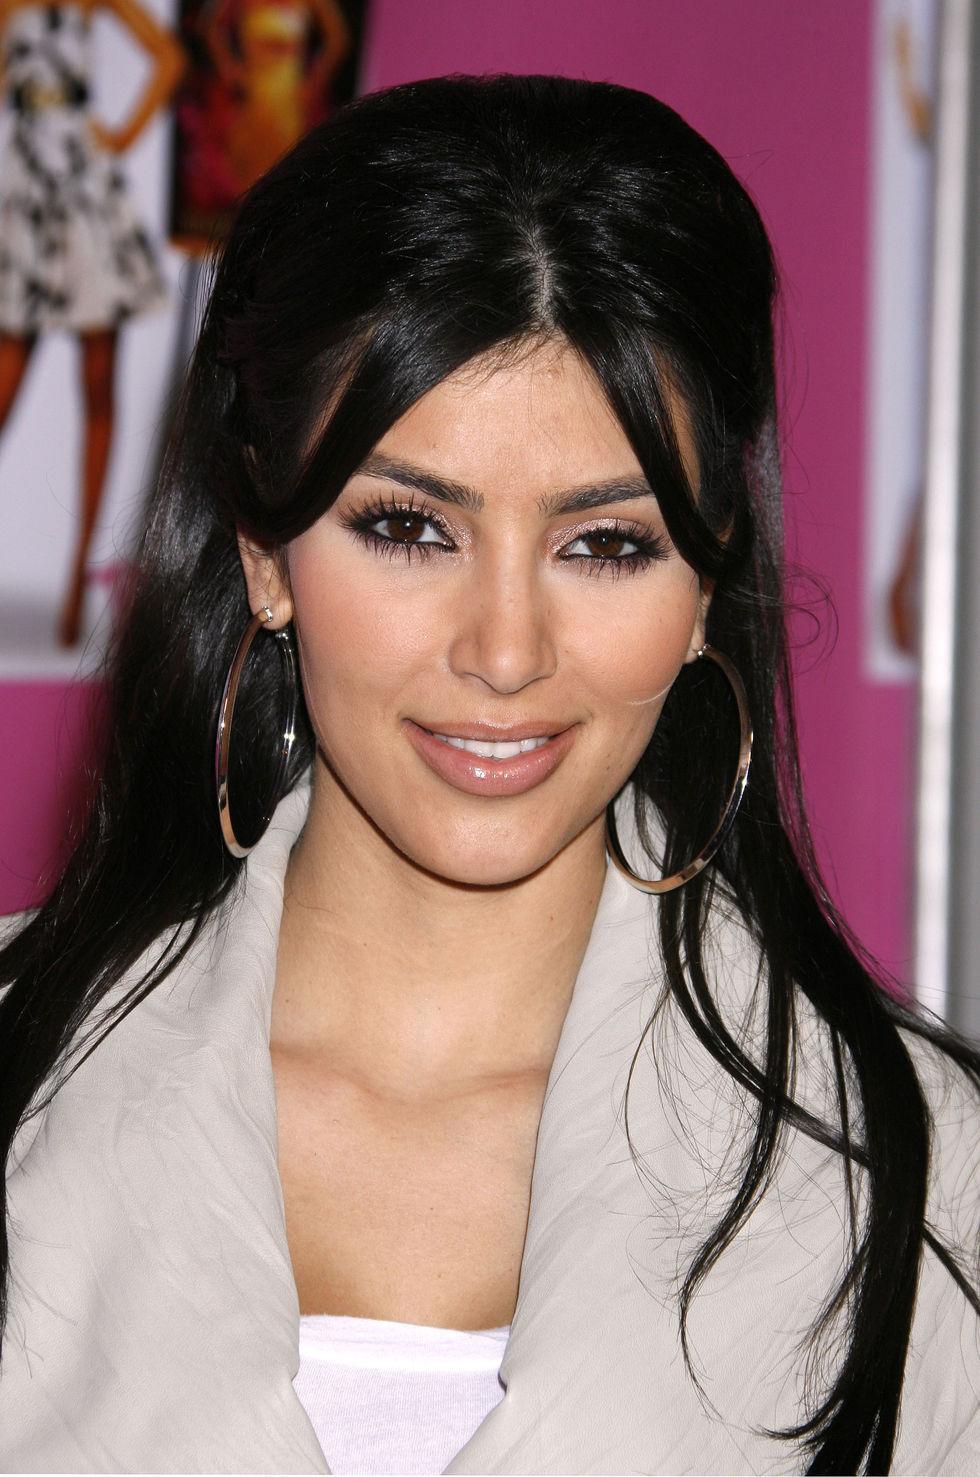 kim-kardashian-cocktail-party-in-los-angeles-01